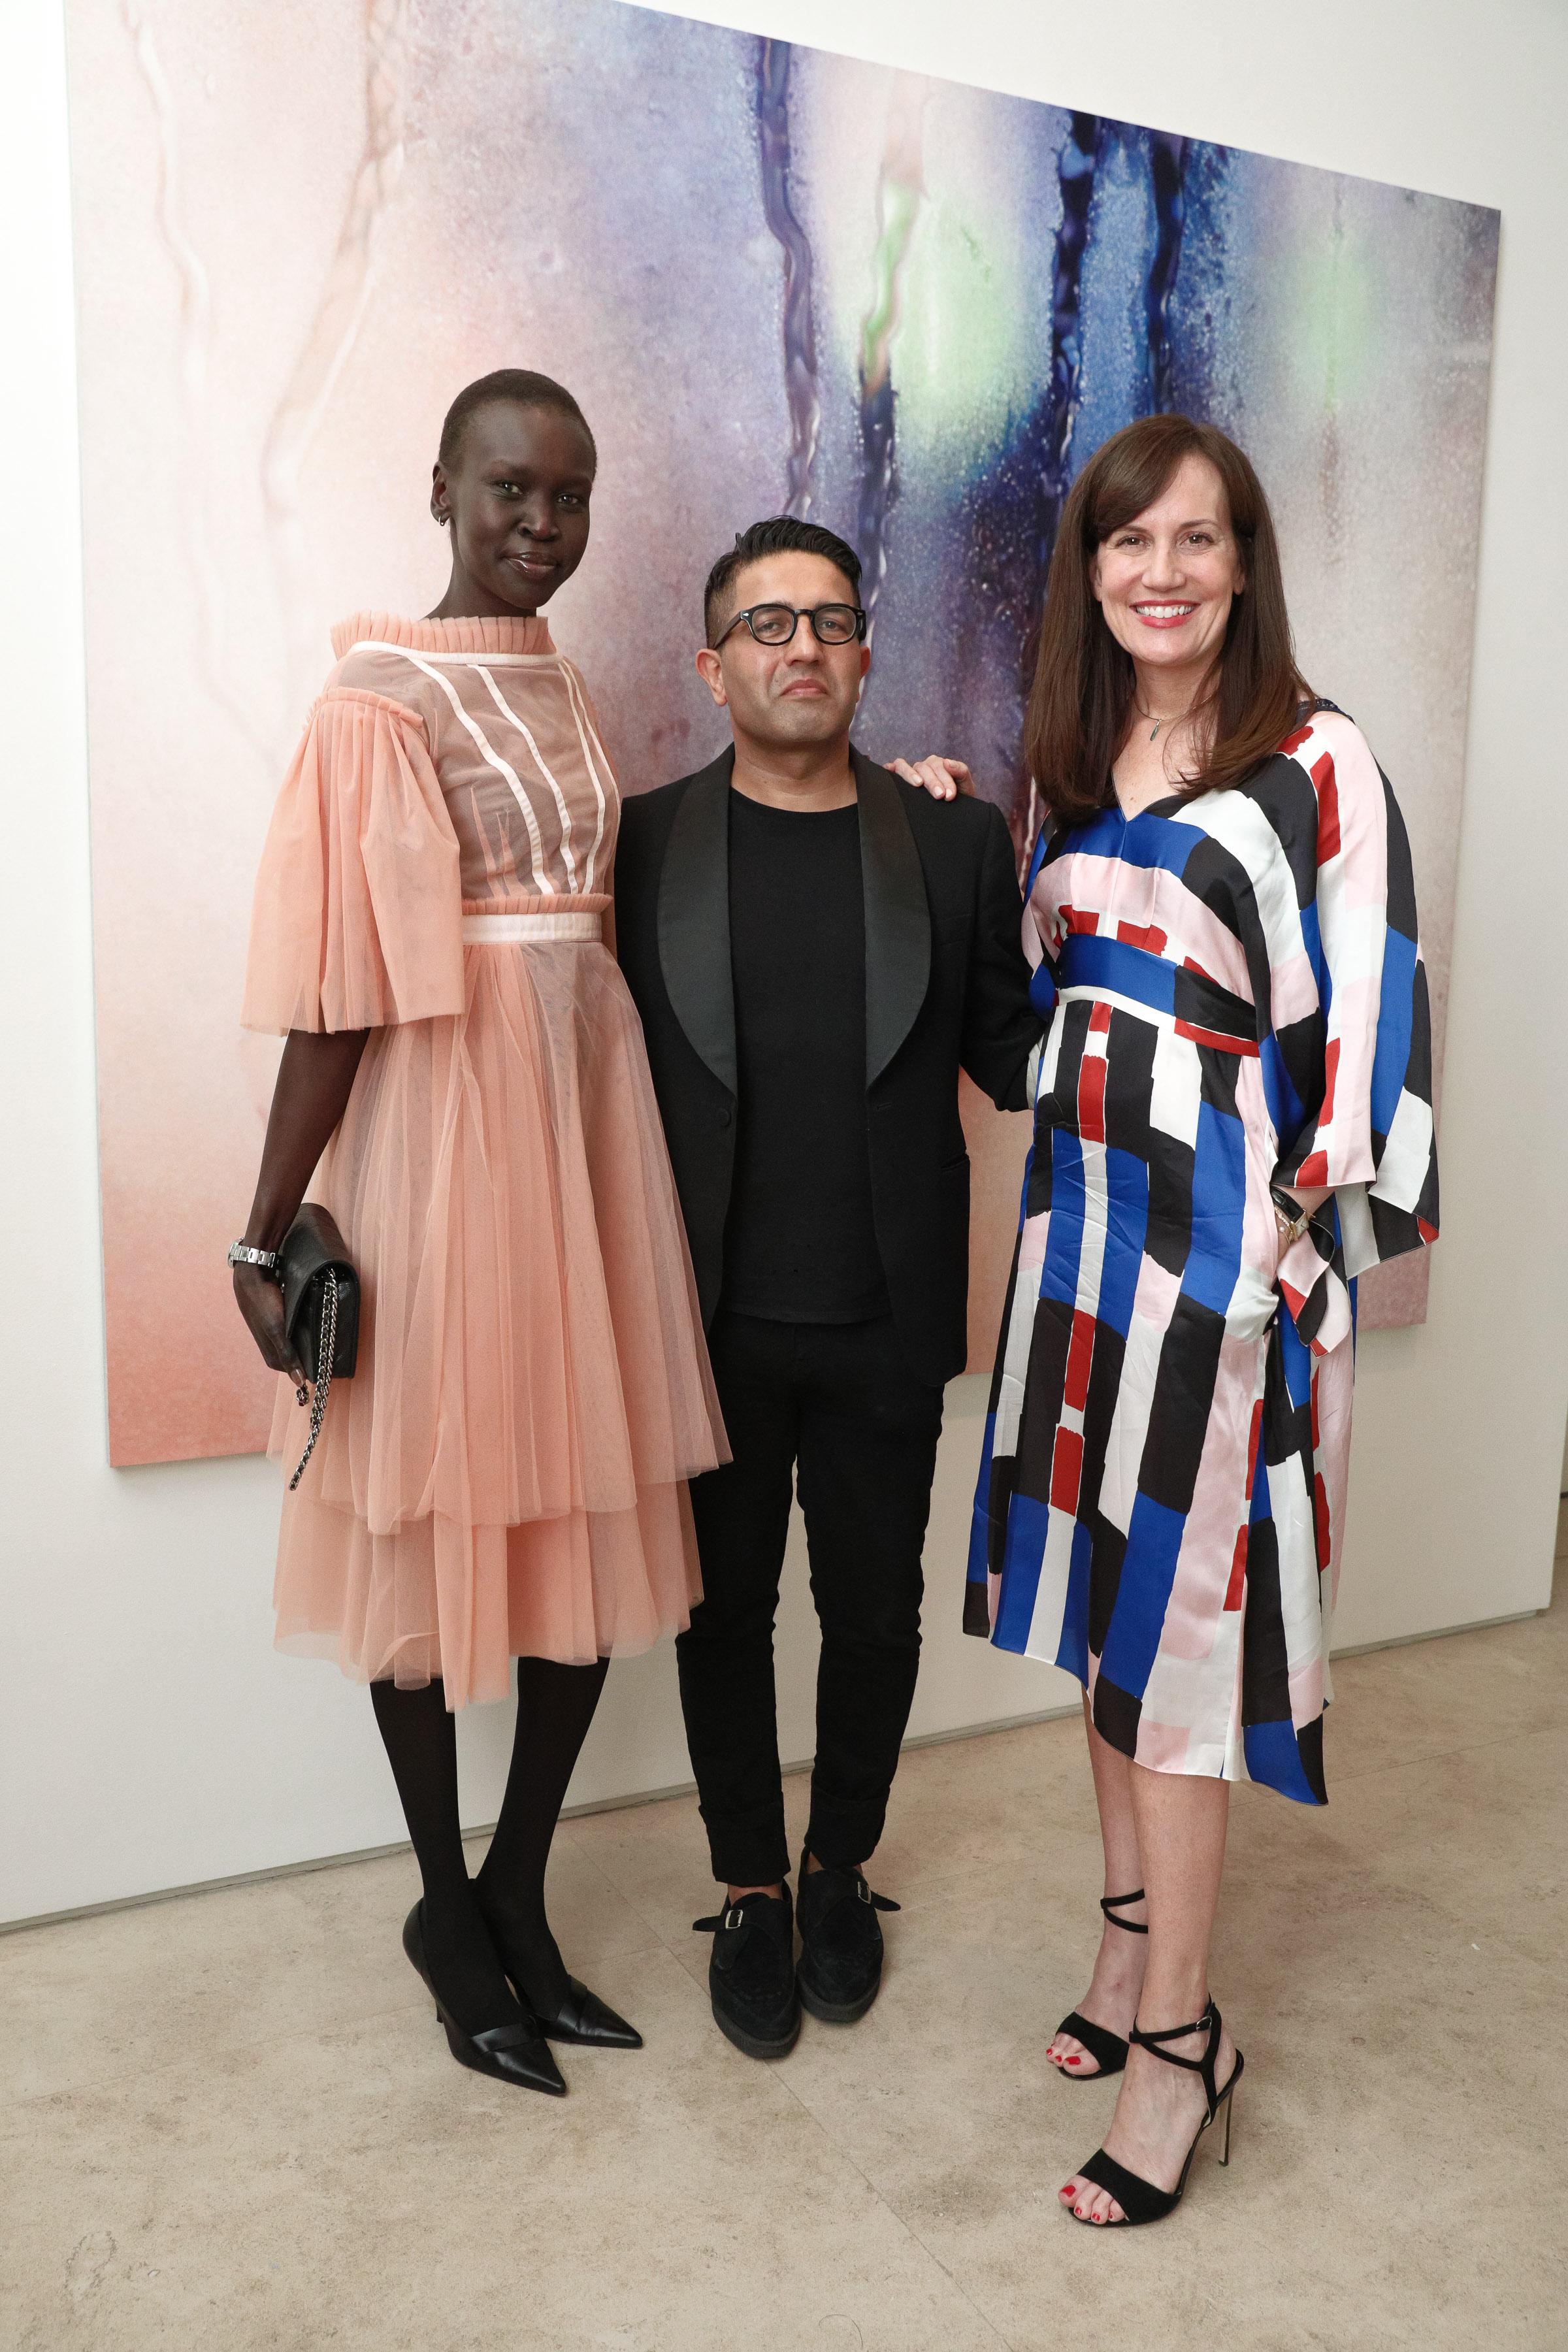 Alek Wek, Osman Yousefzada, Daniella VitaleOsman launch, Barneys New York, USA - 12 Apr 2017